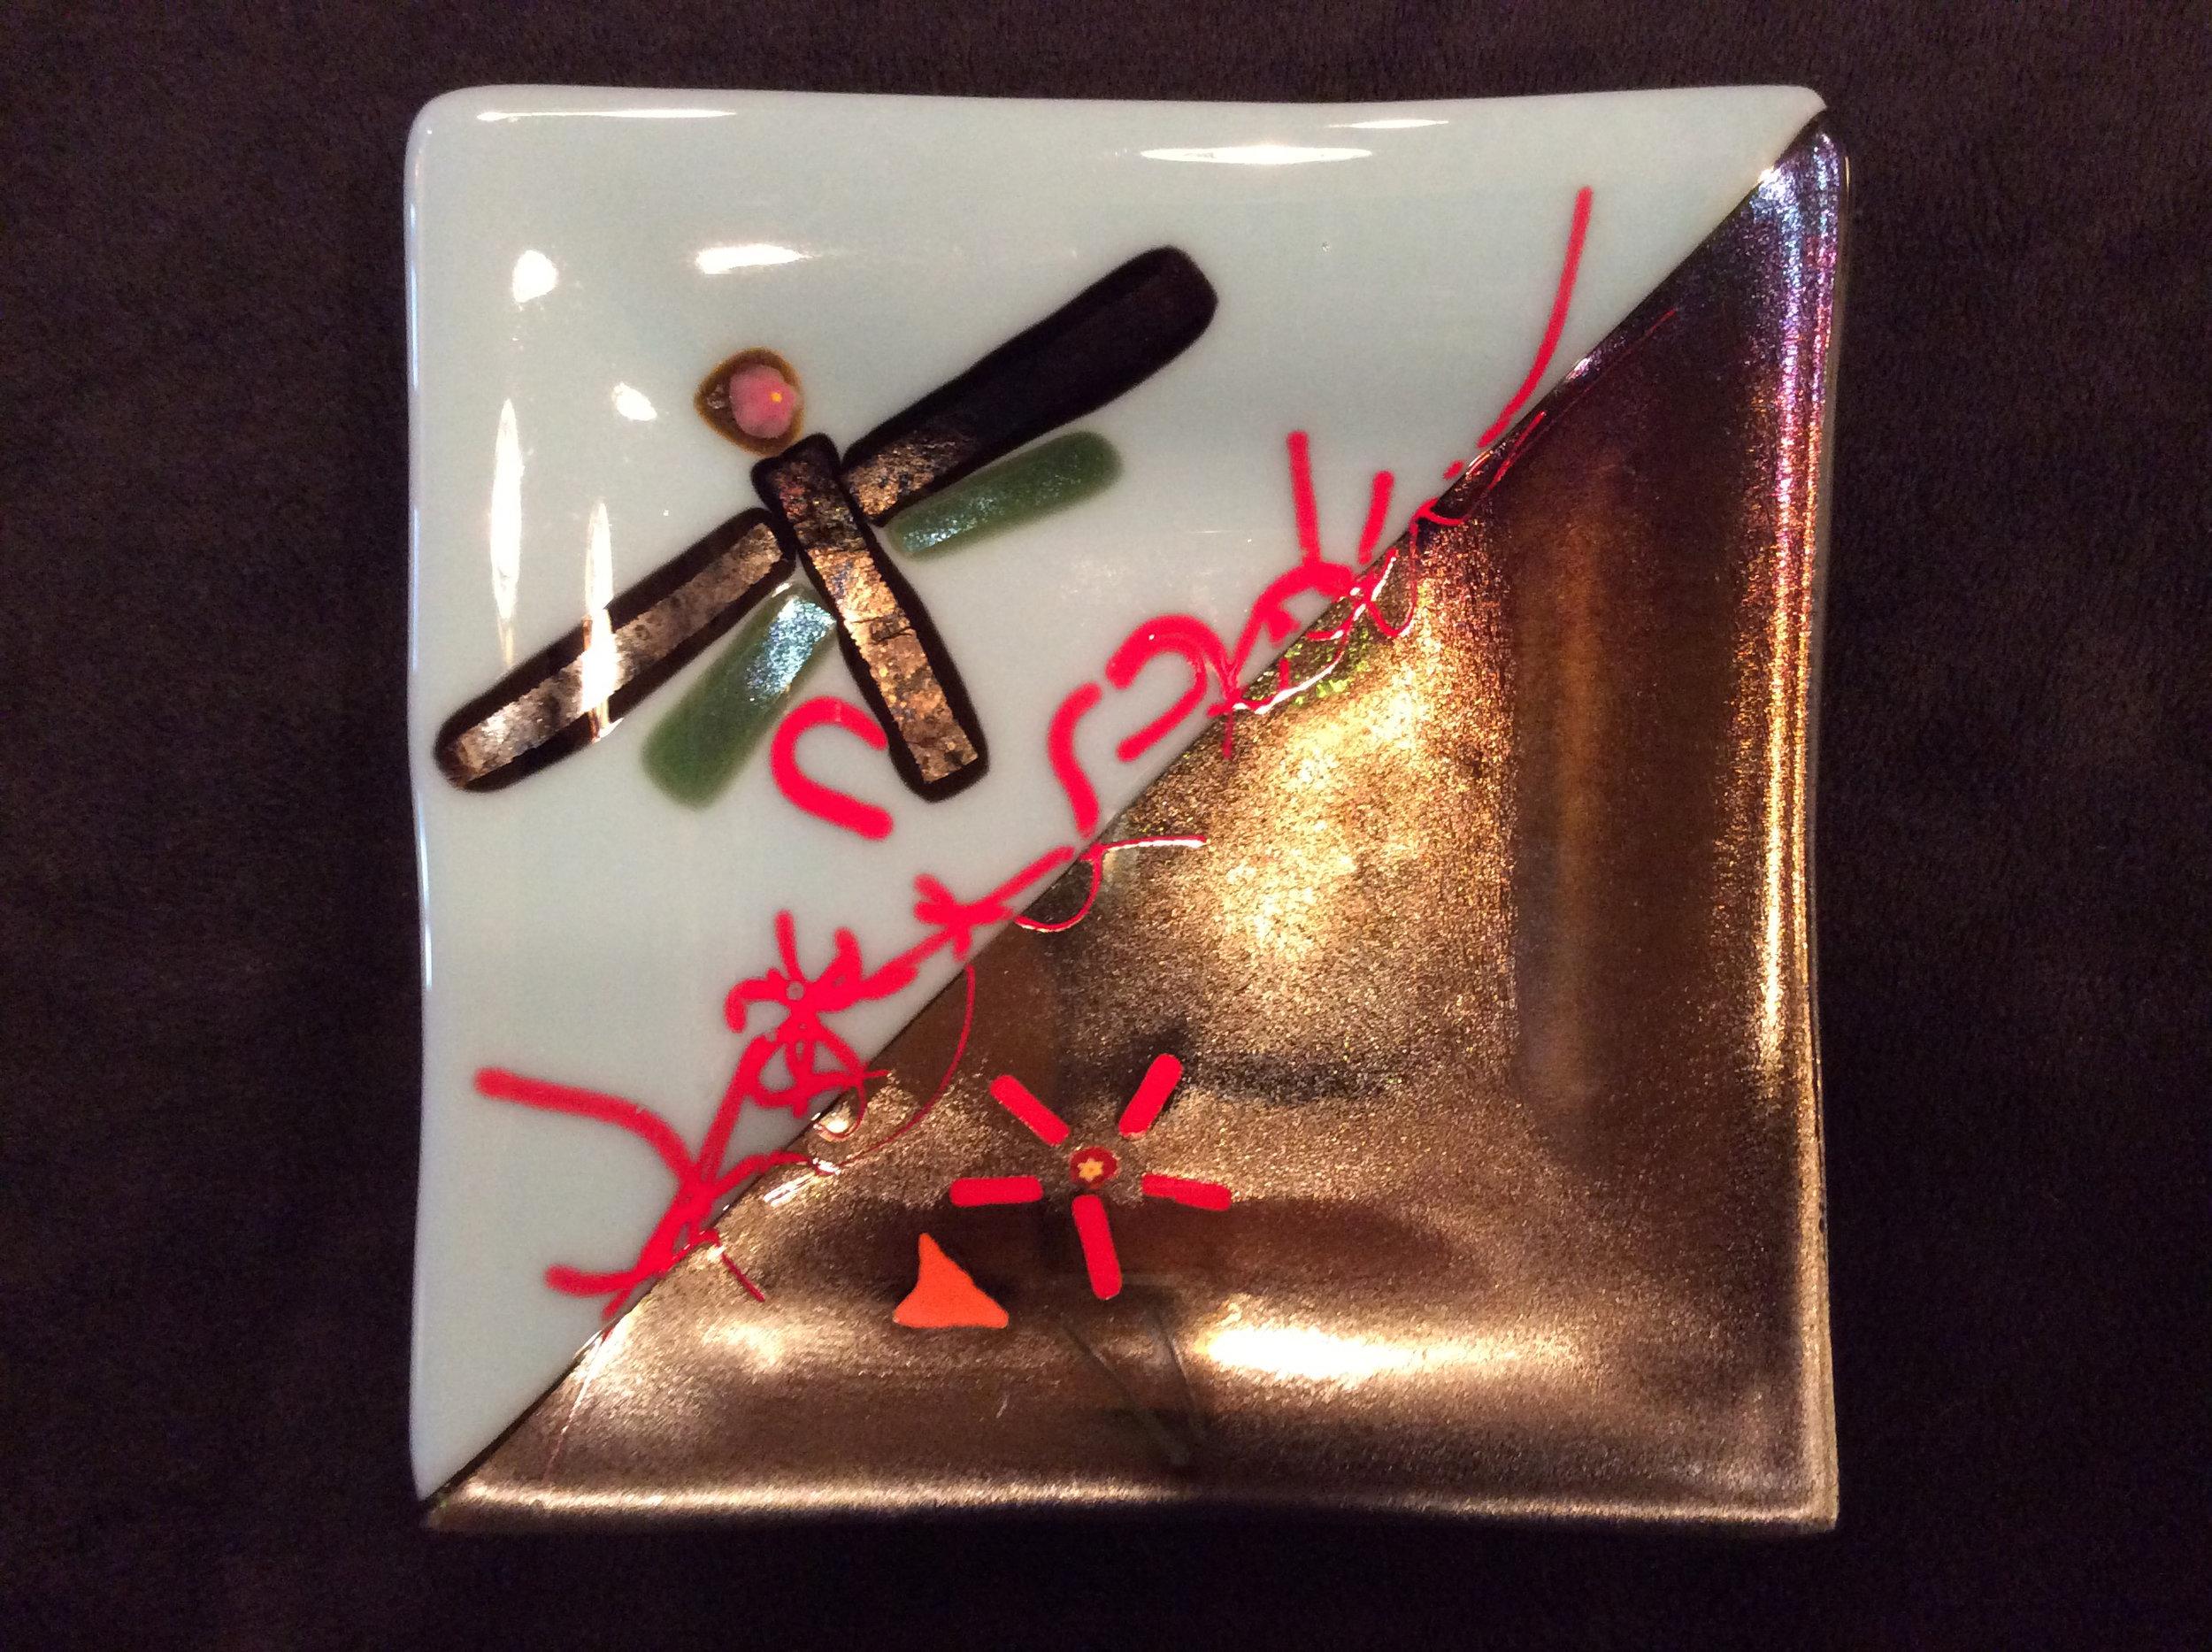 Char Hale dragonfly plate 300dpi.jpg